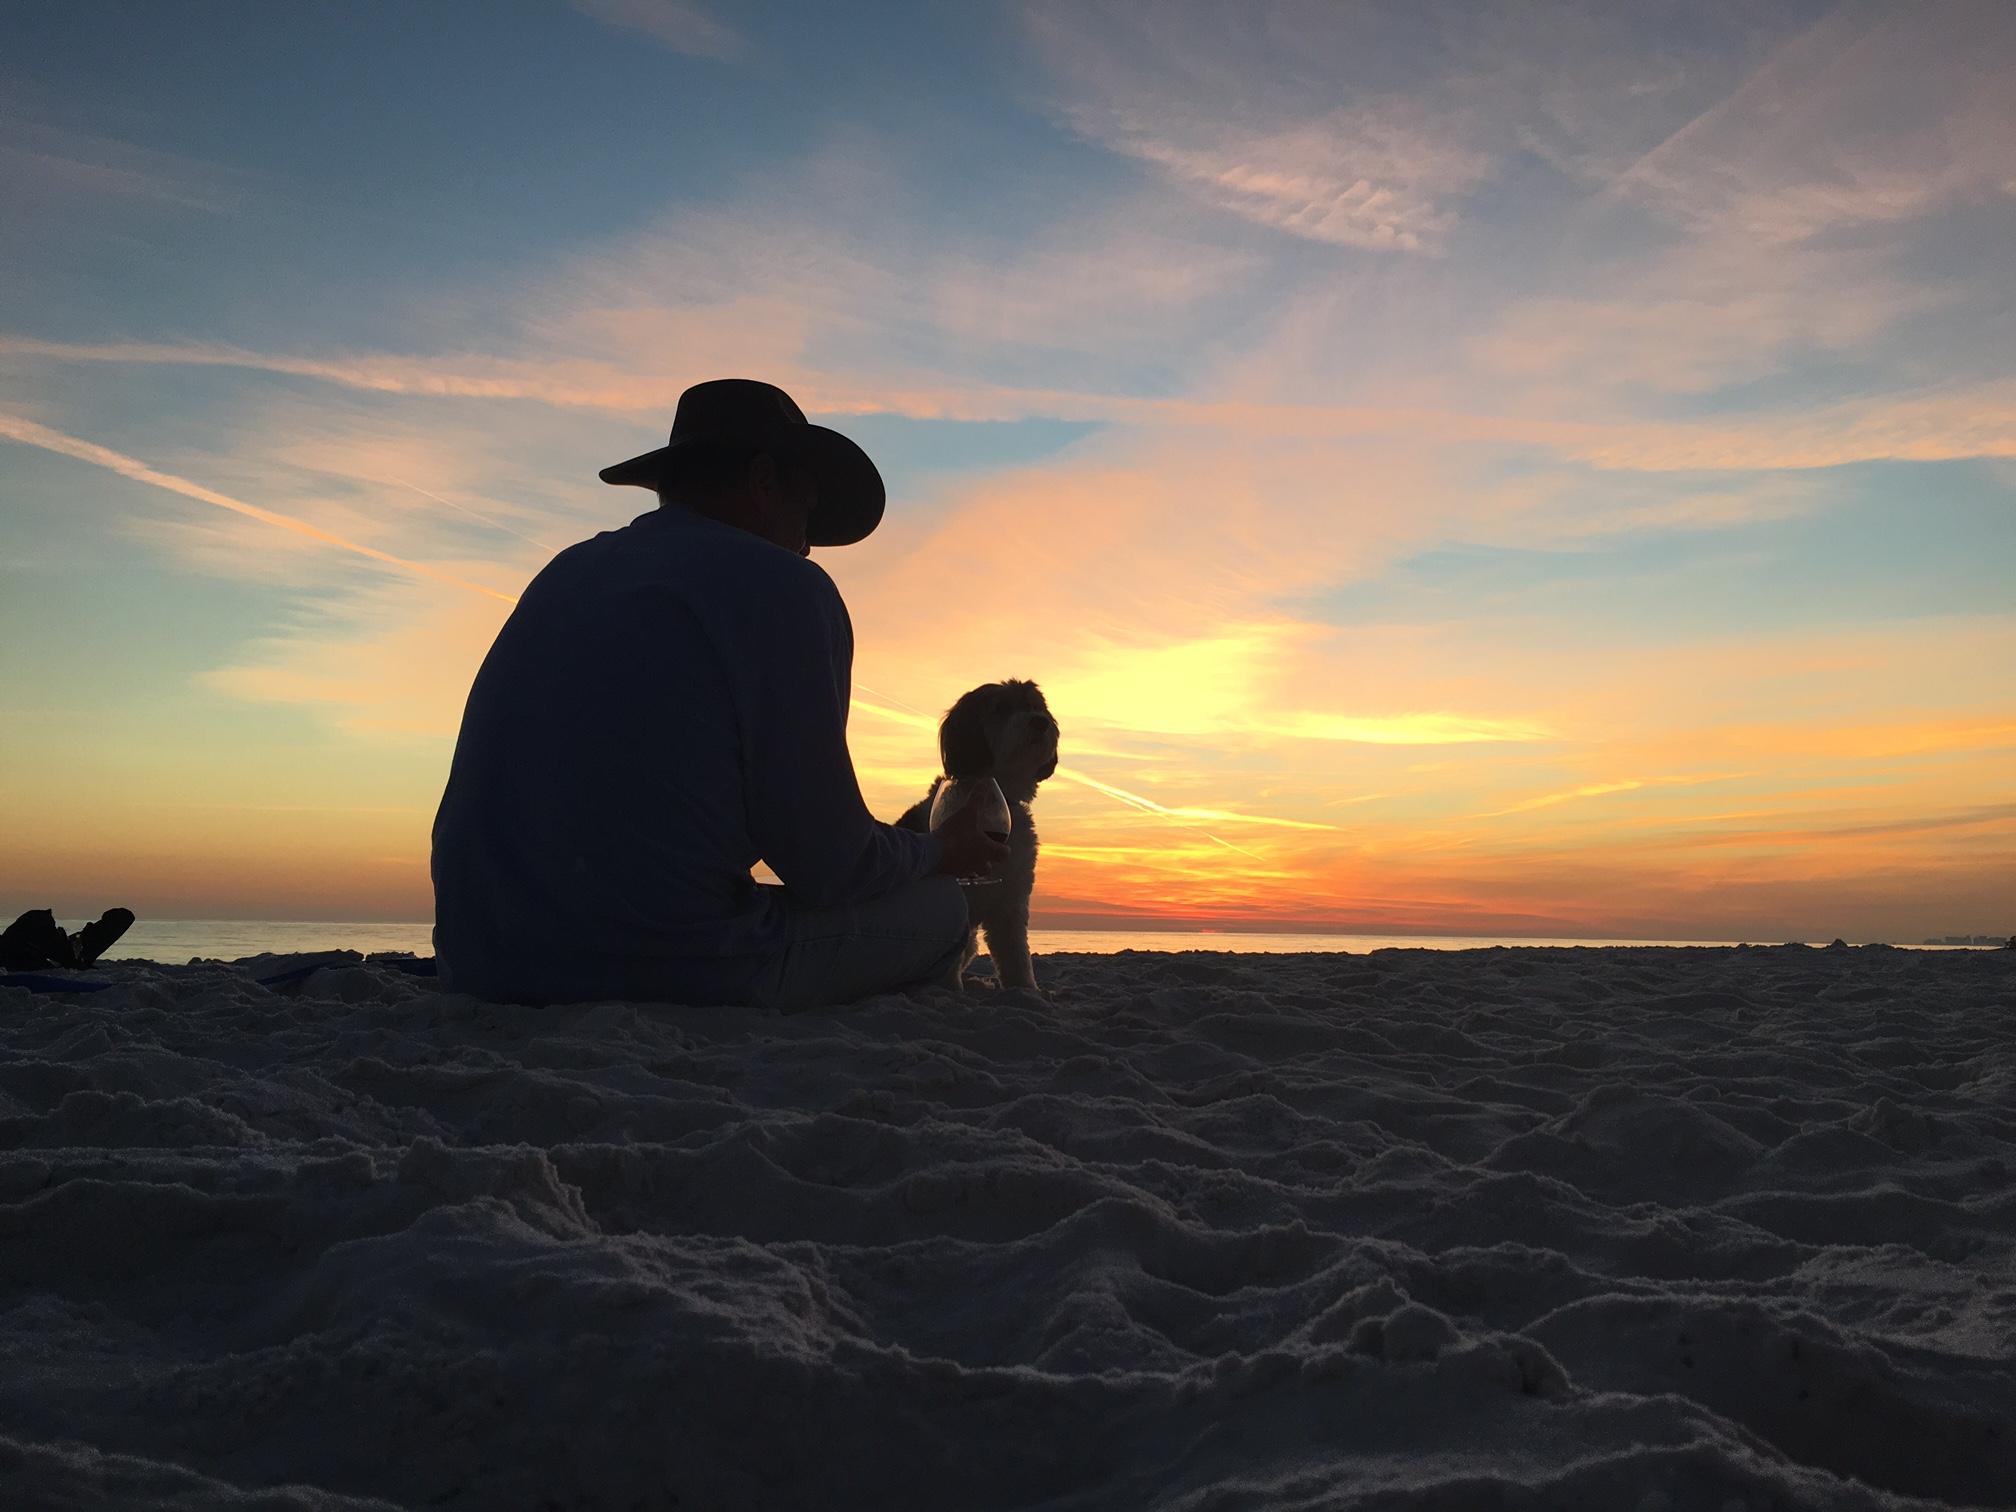 """Shep"" Rob Wood - Santa Rosa Beach, FL"